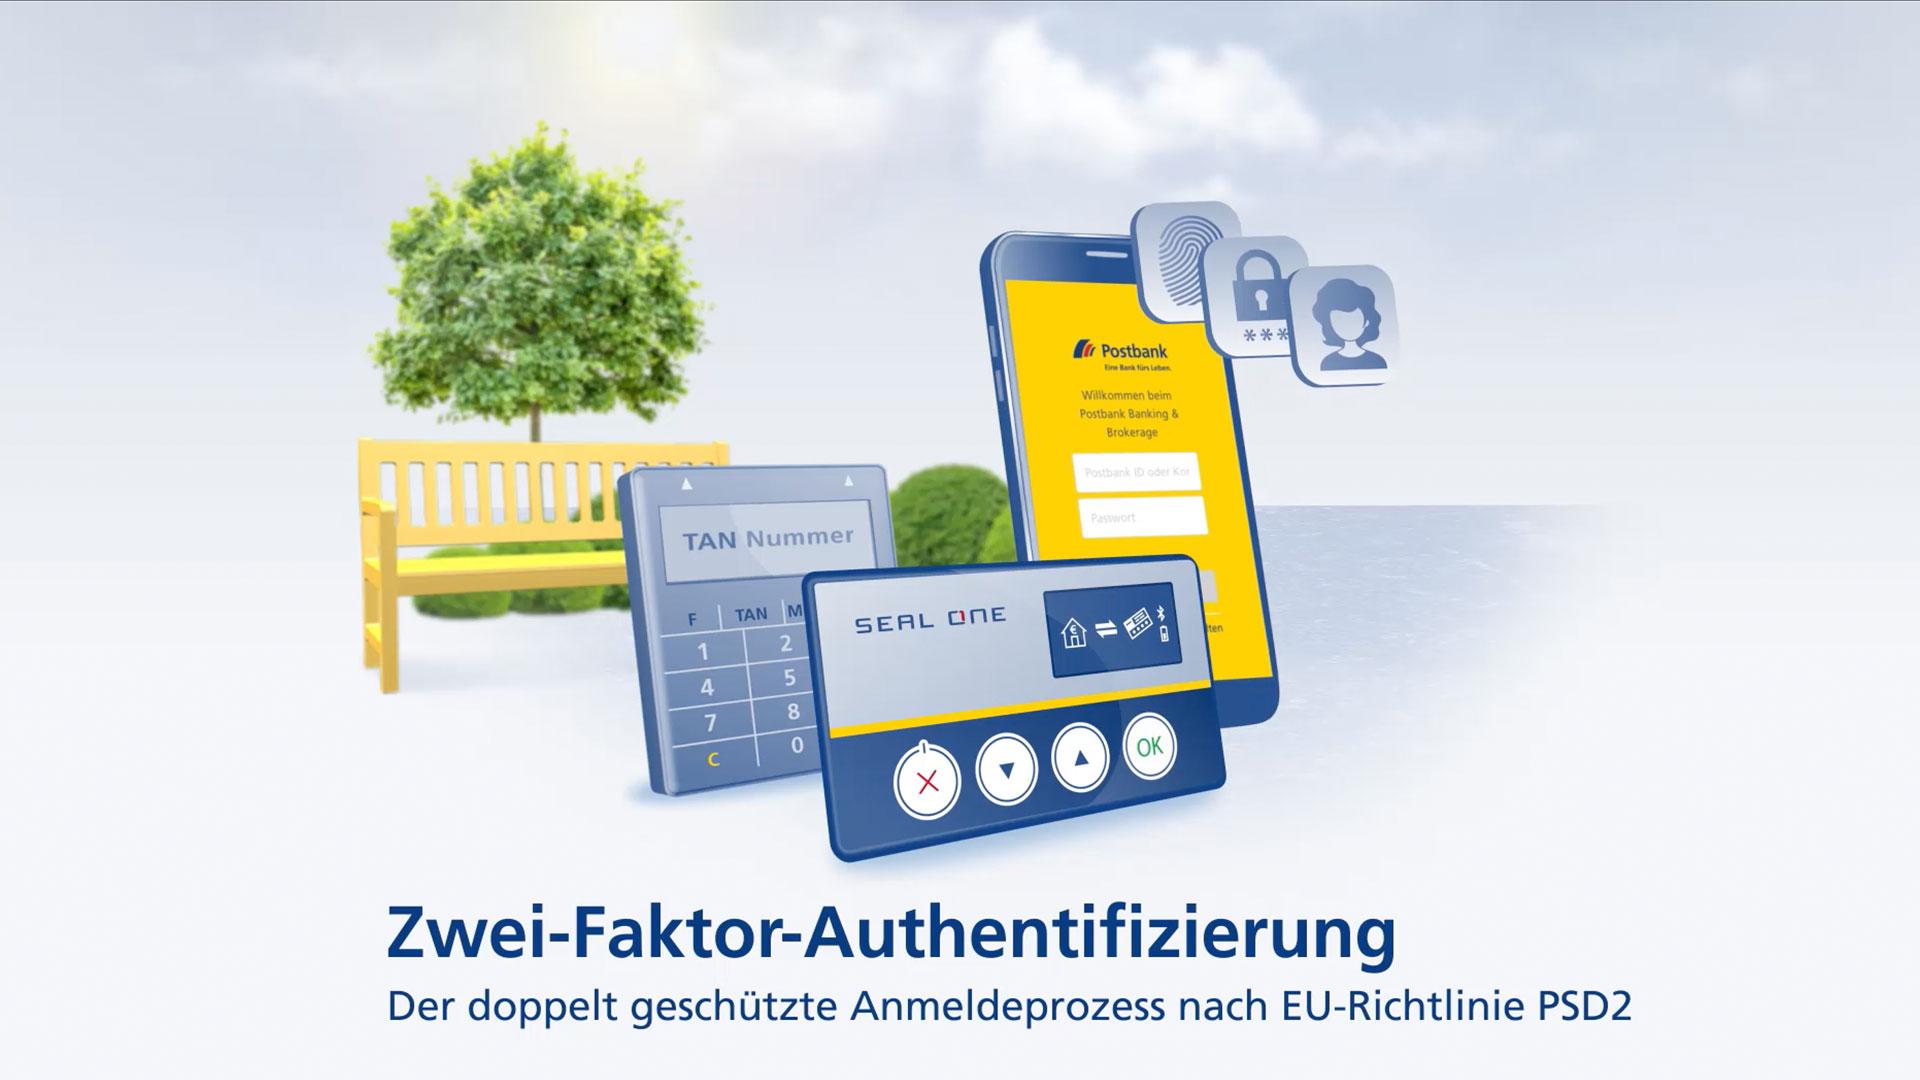 postbank-themenwelten-neuer-zugang-online-banking-video-1920x1080.jpg